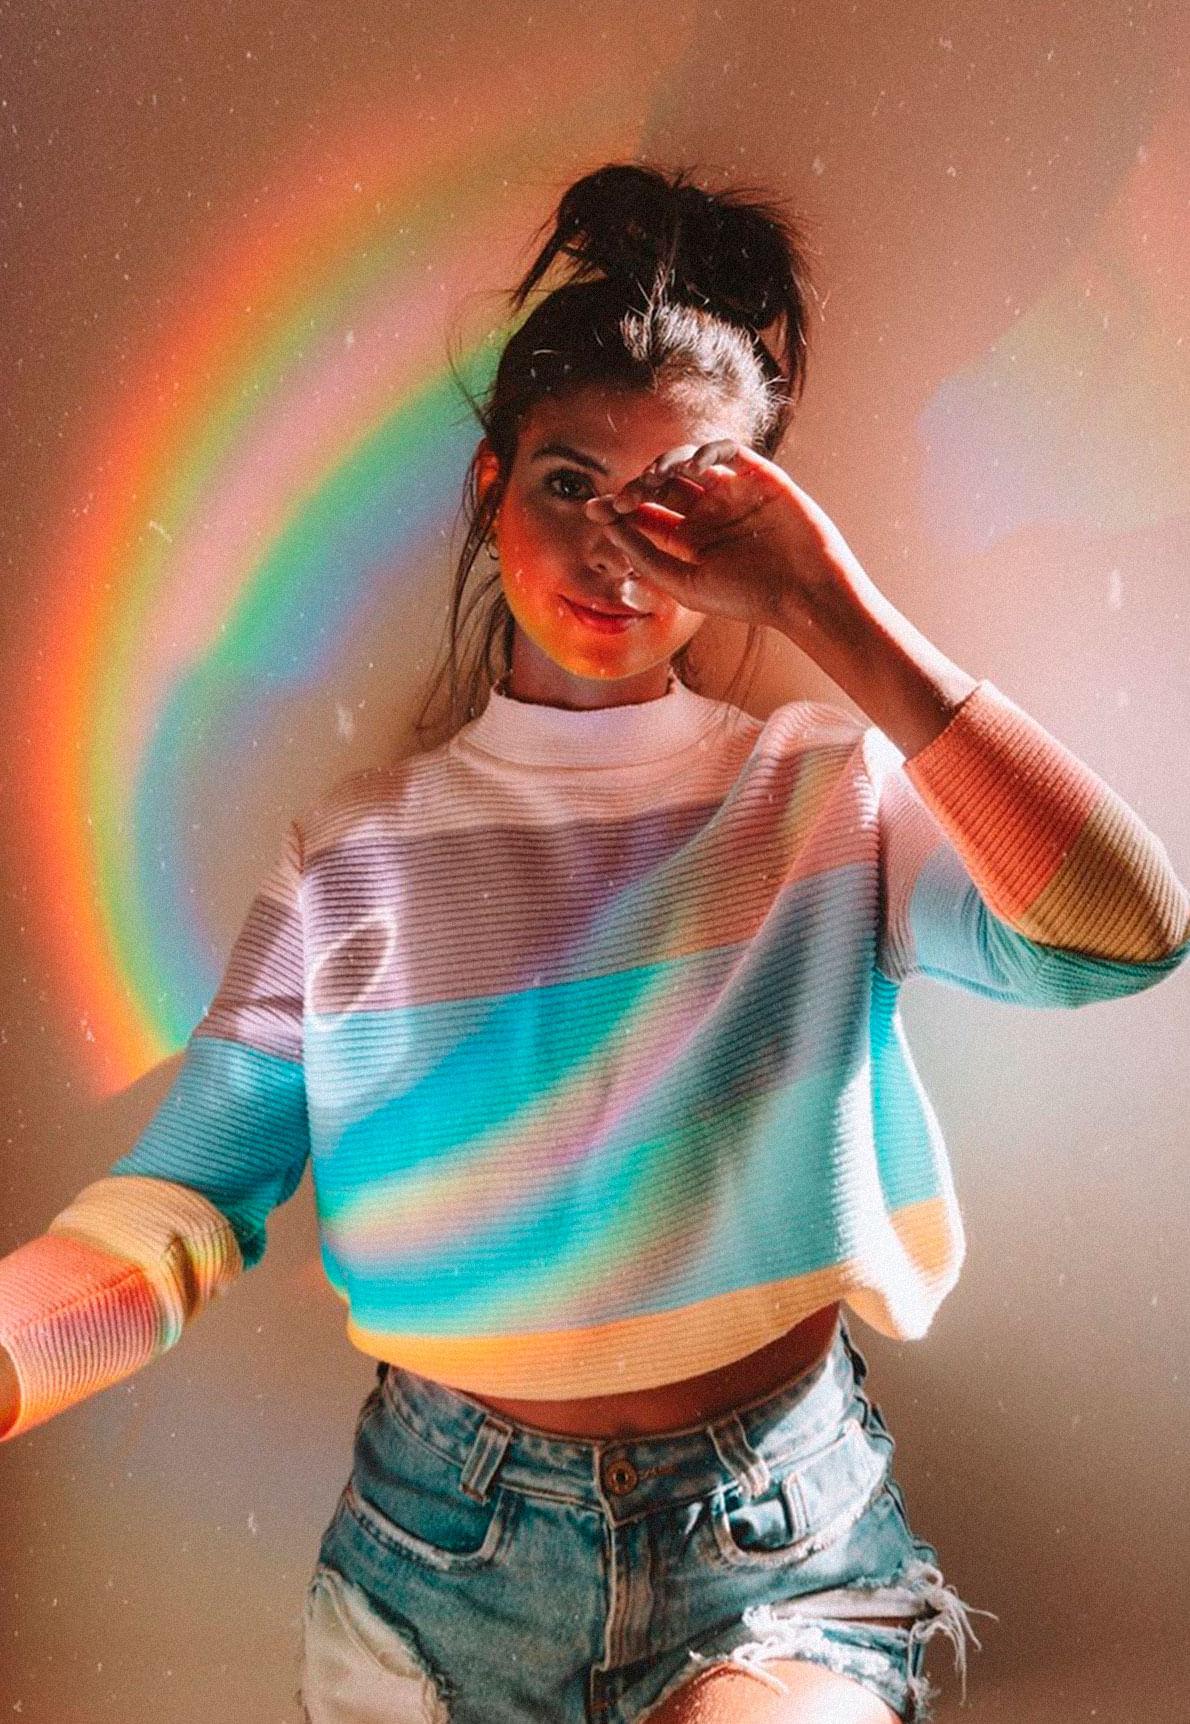 10082-trico-colorido-rainbow-mundo-lolita-09